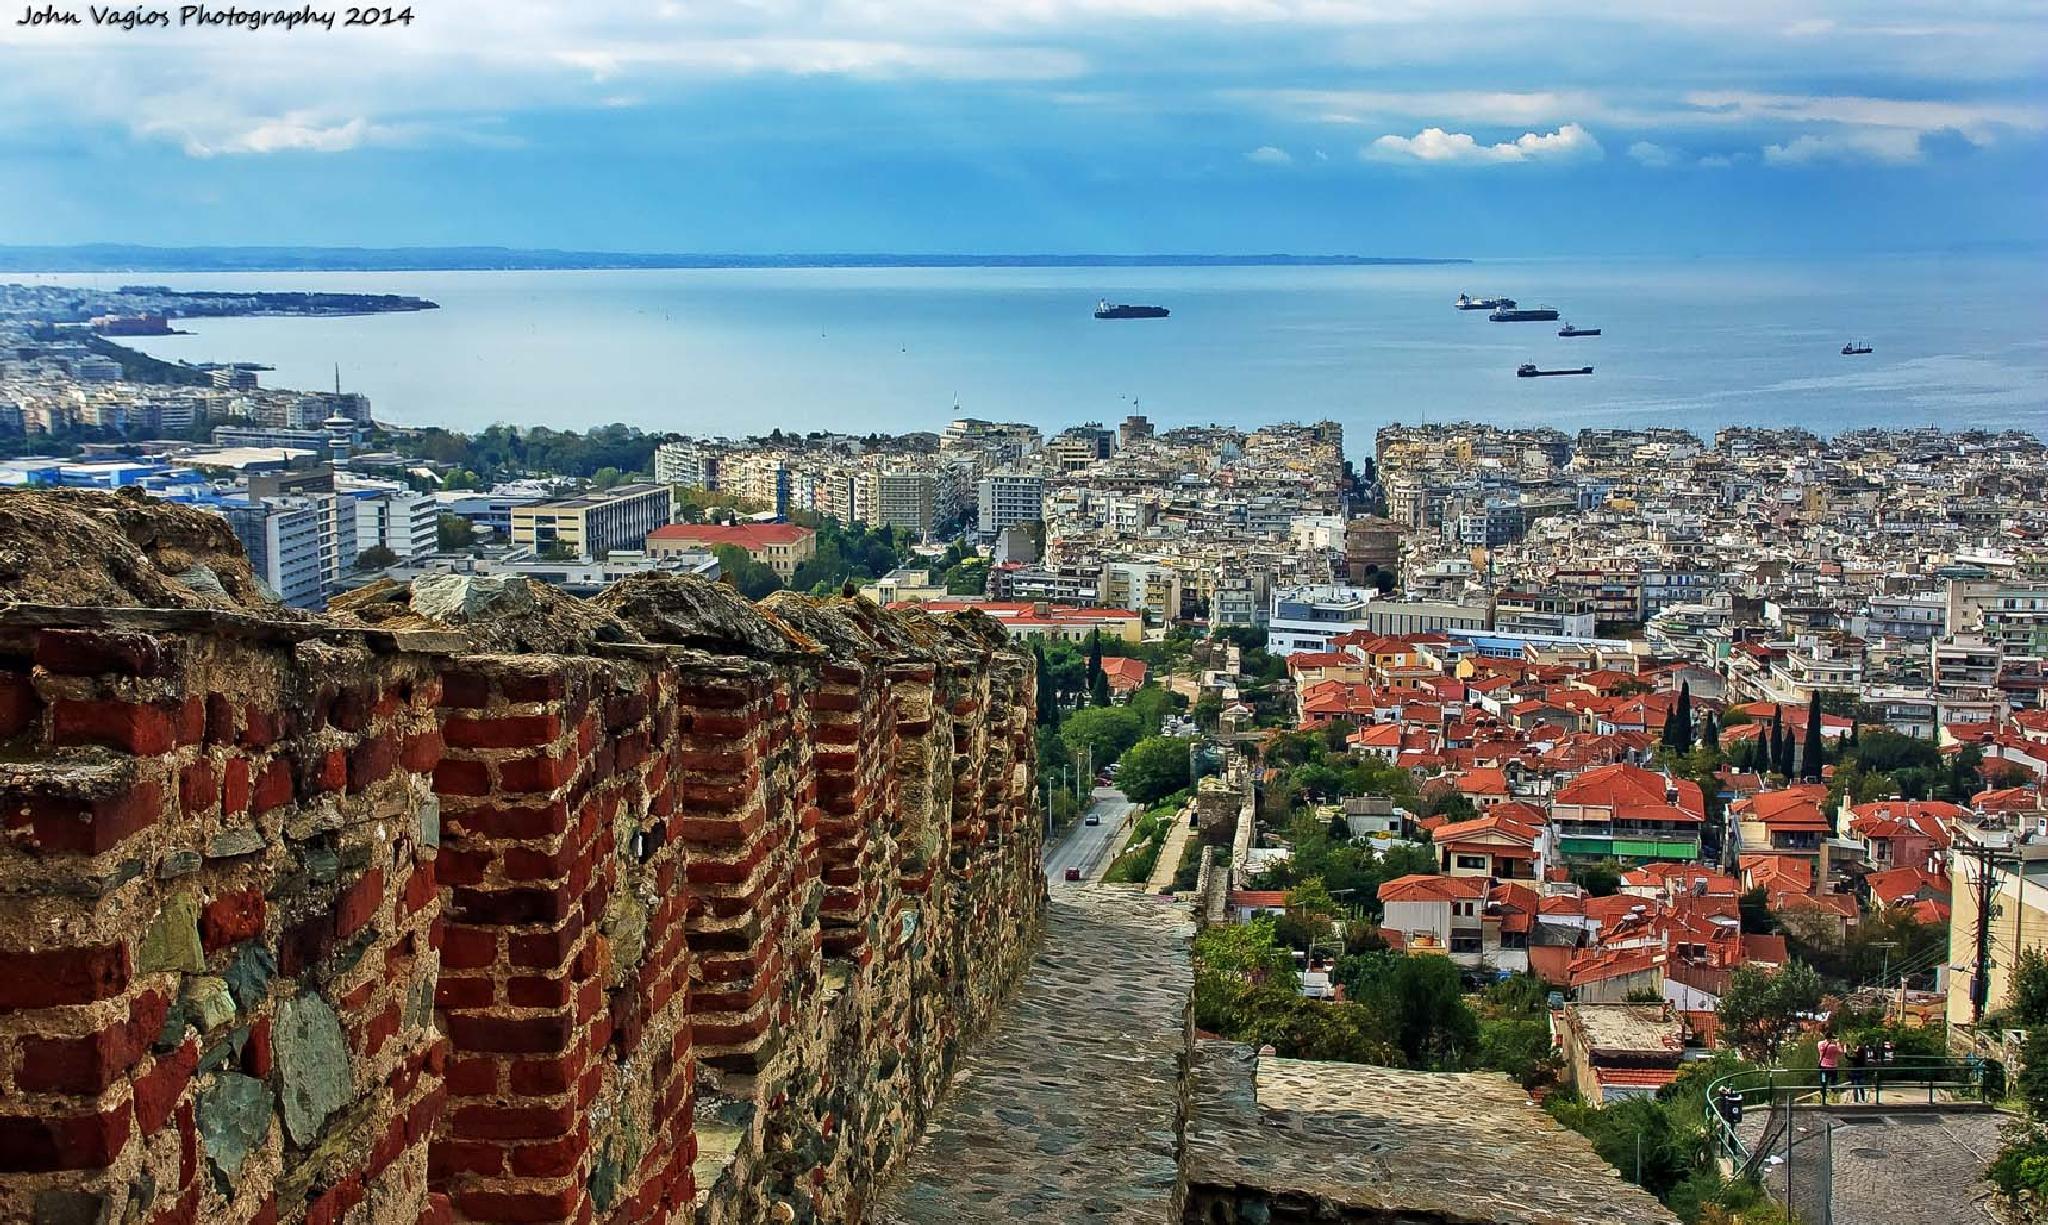 Thessaloniki by JohnVagios